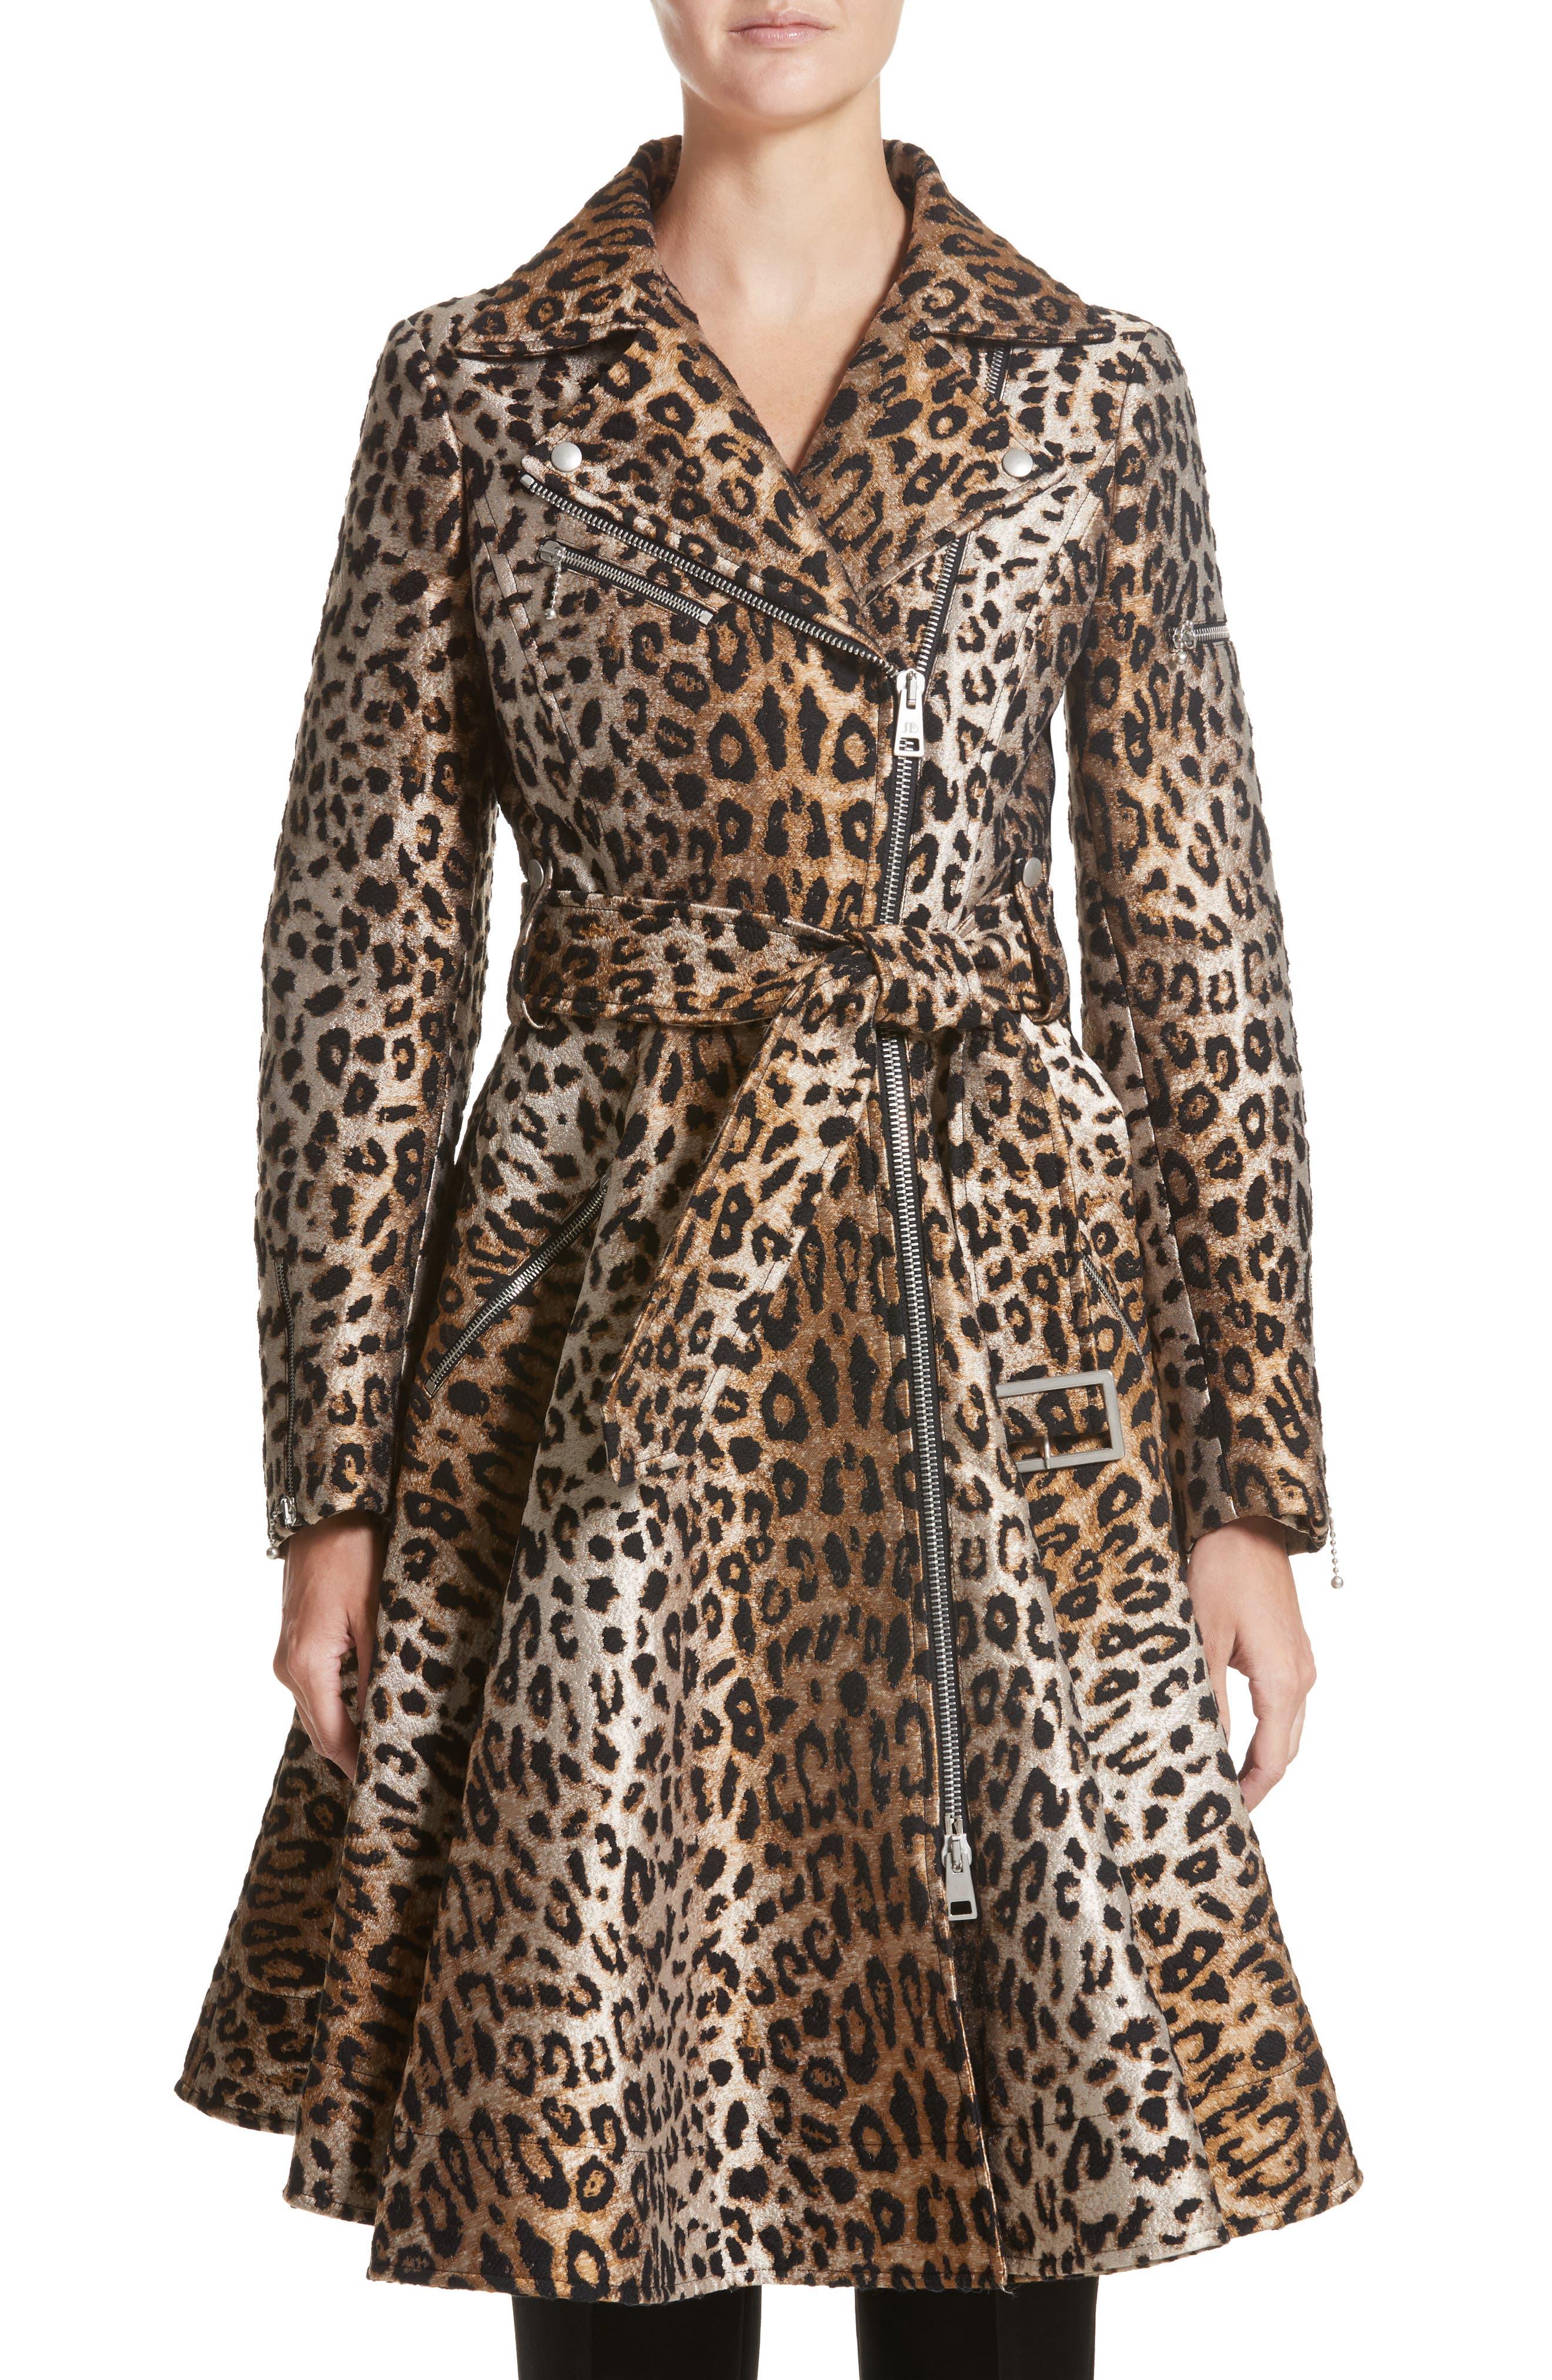 Main Image - Sara Battaglia Leopard Jacquard Trench Coat